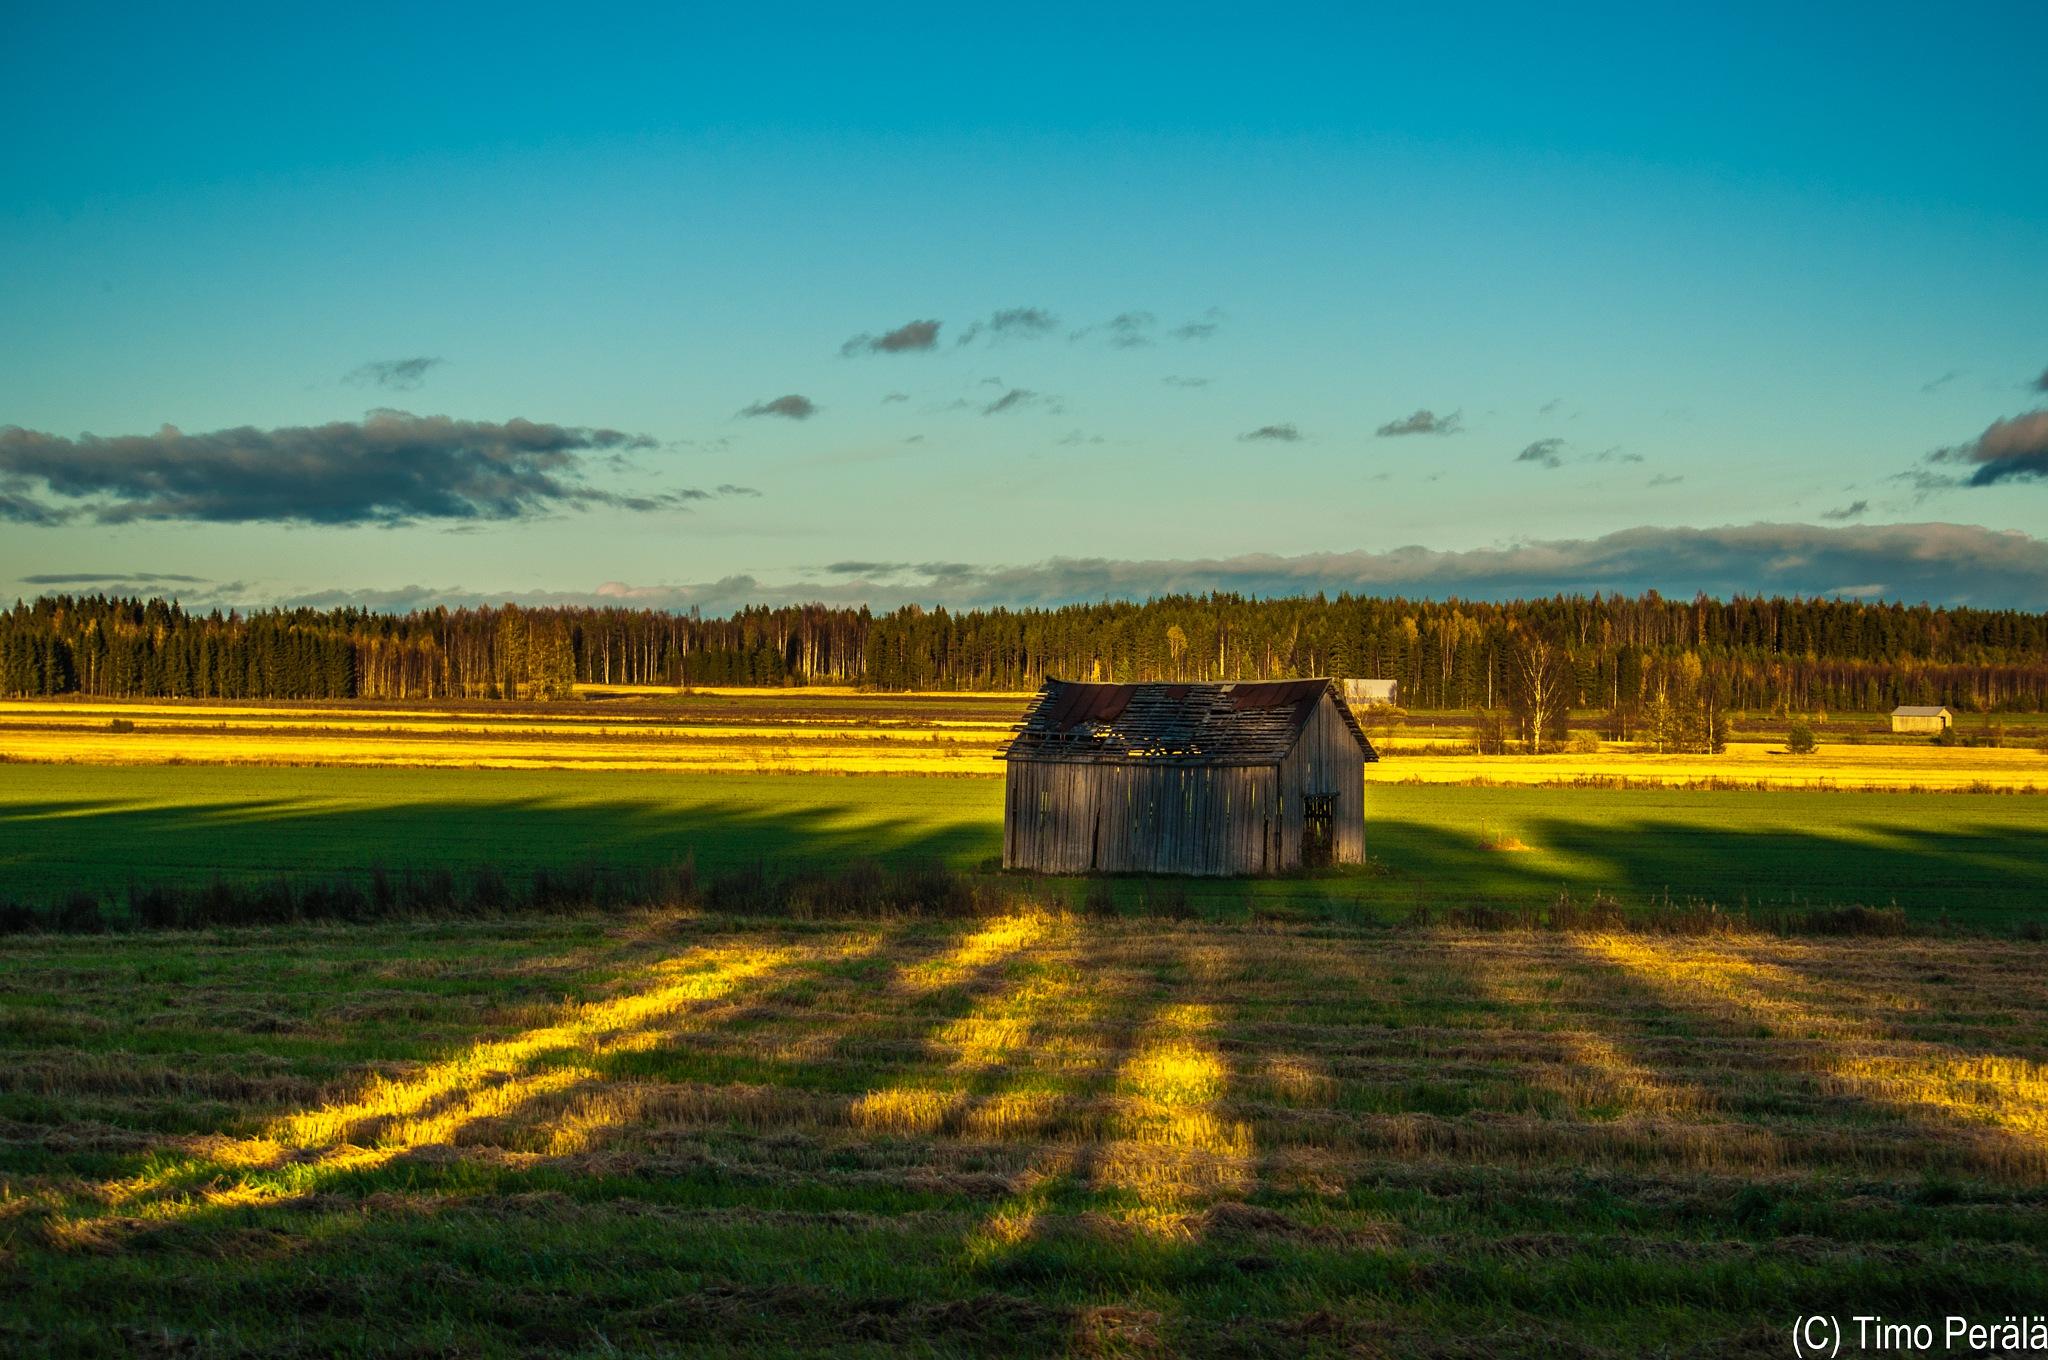 Shadows reach the barn by Timo Perala